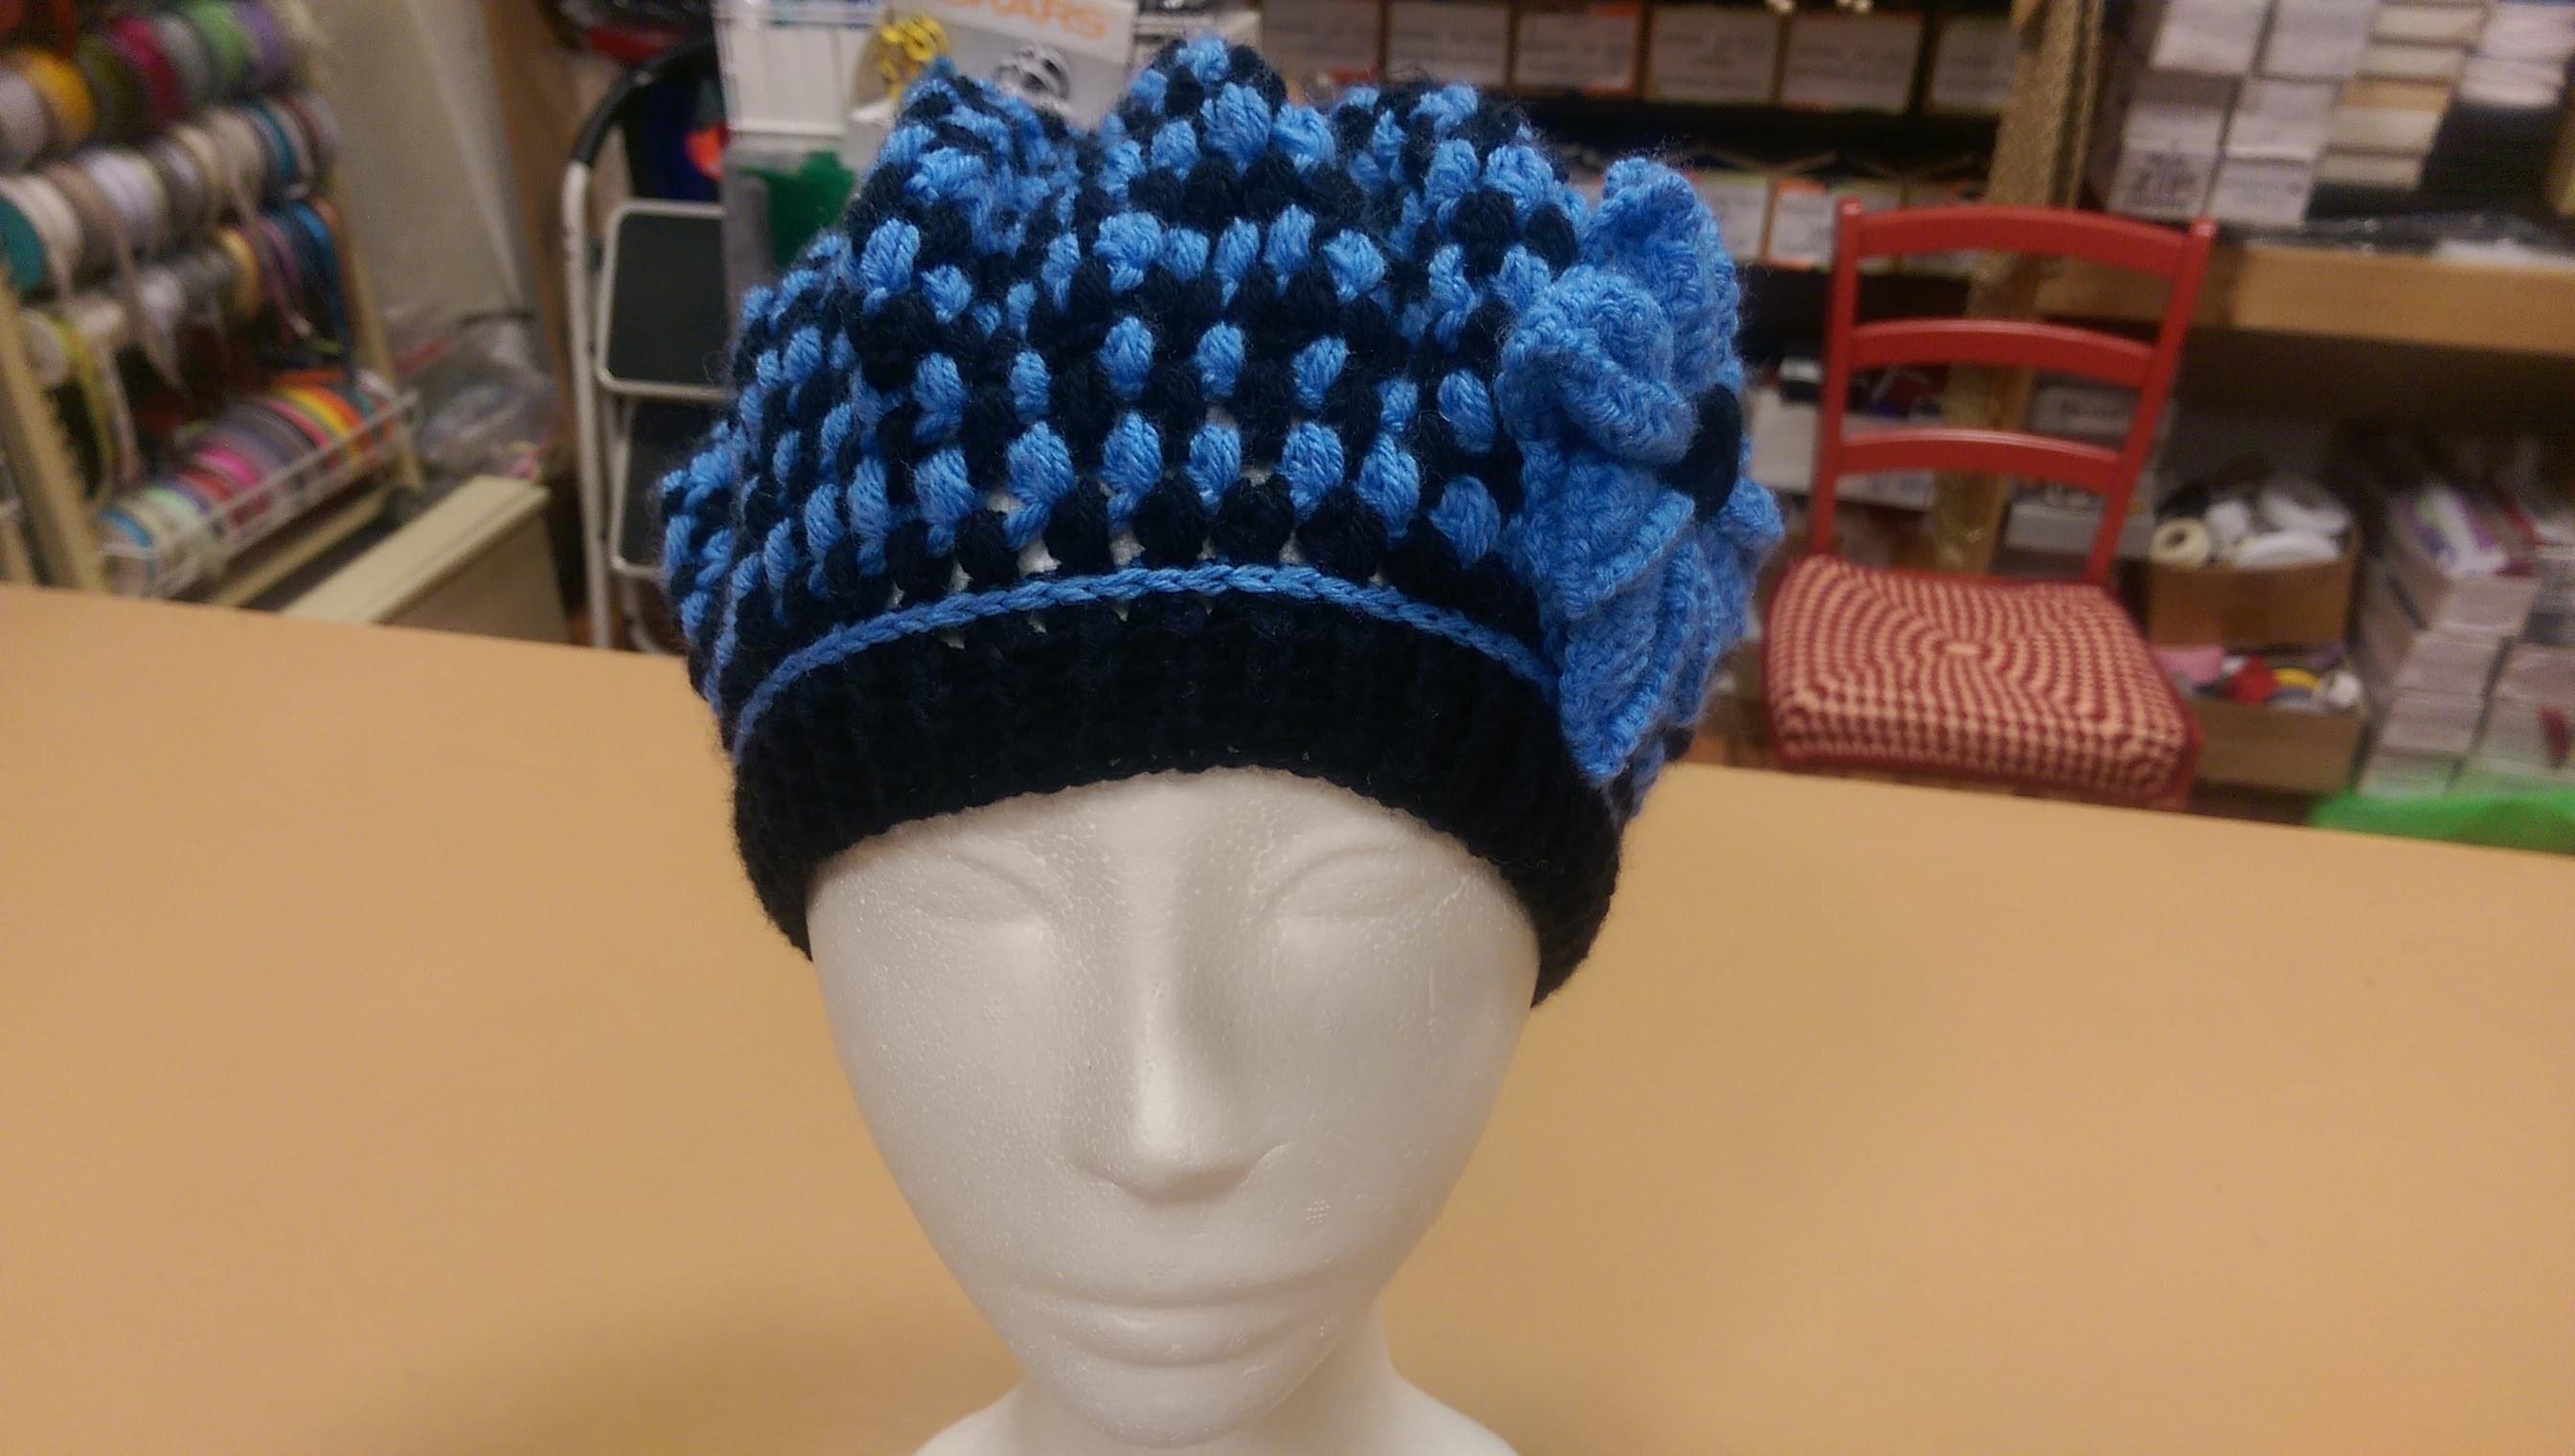 TUTORIAL PARTE 2: Basco all'uncinetto, punto Puff Stich - How to crochet a beret